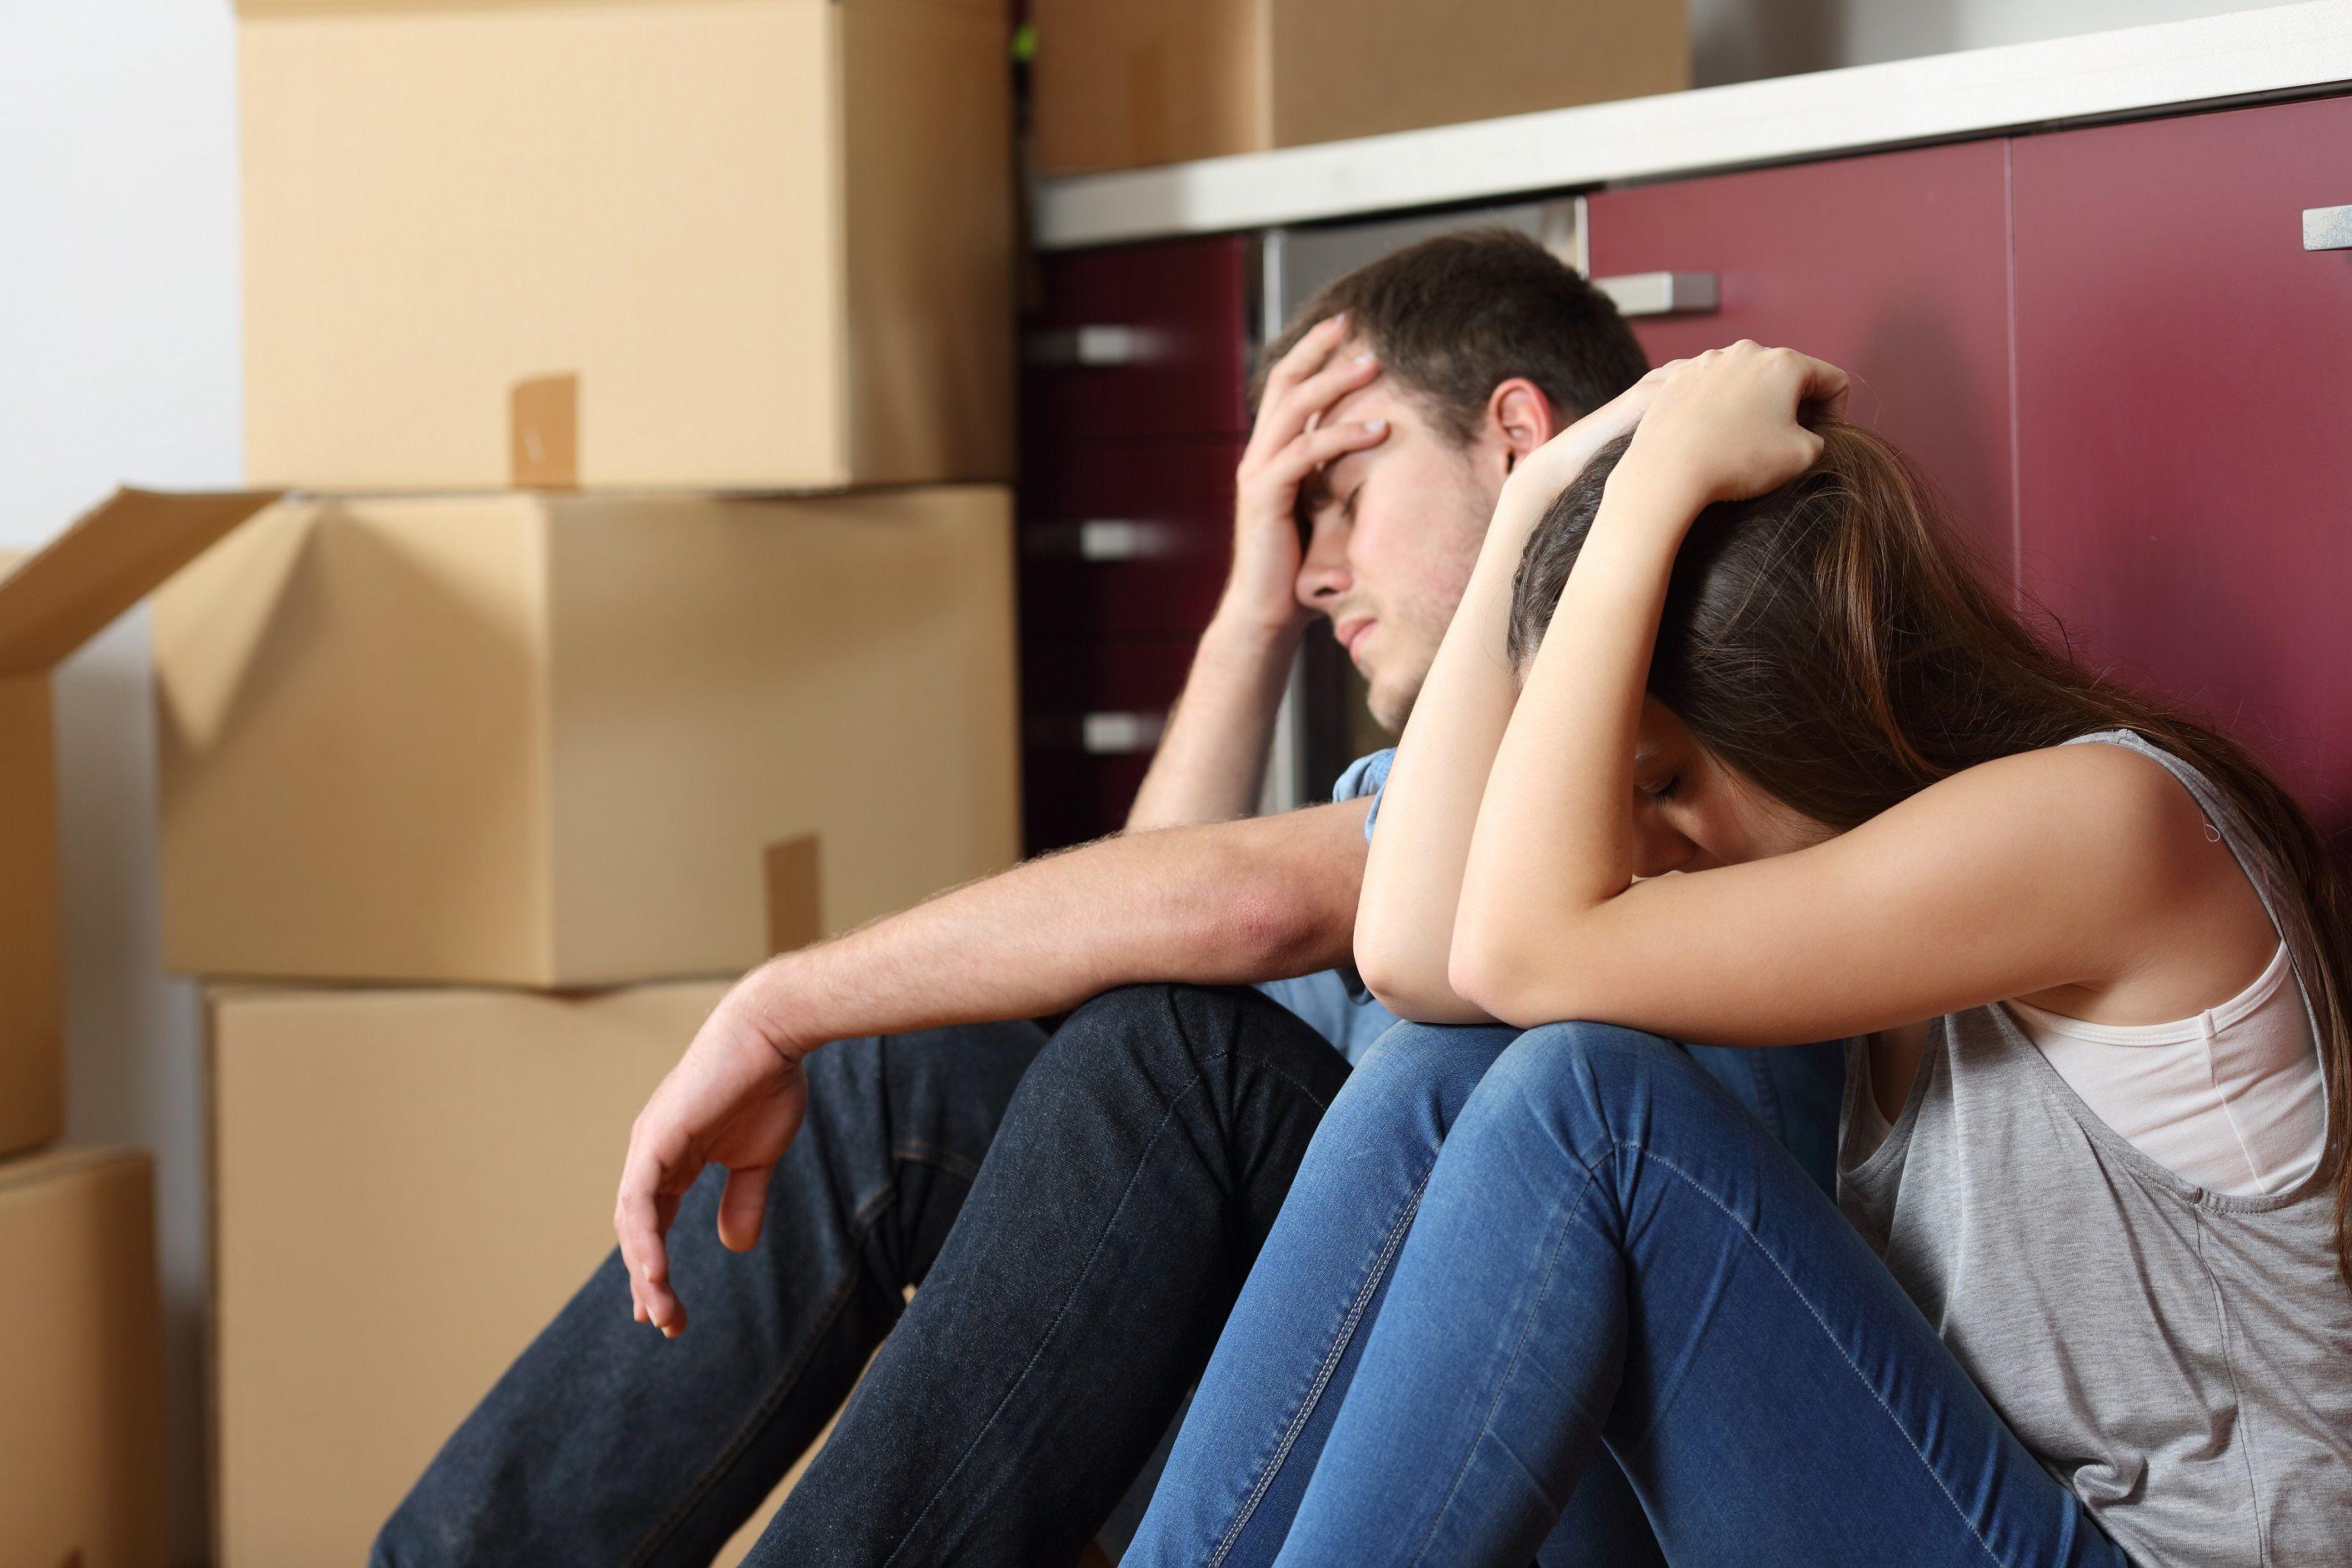 Couple sitting on the floor looking upset.